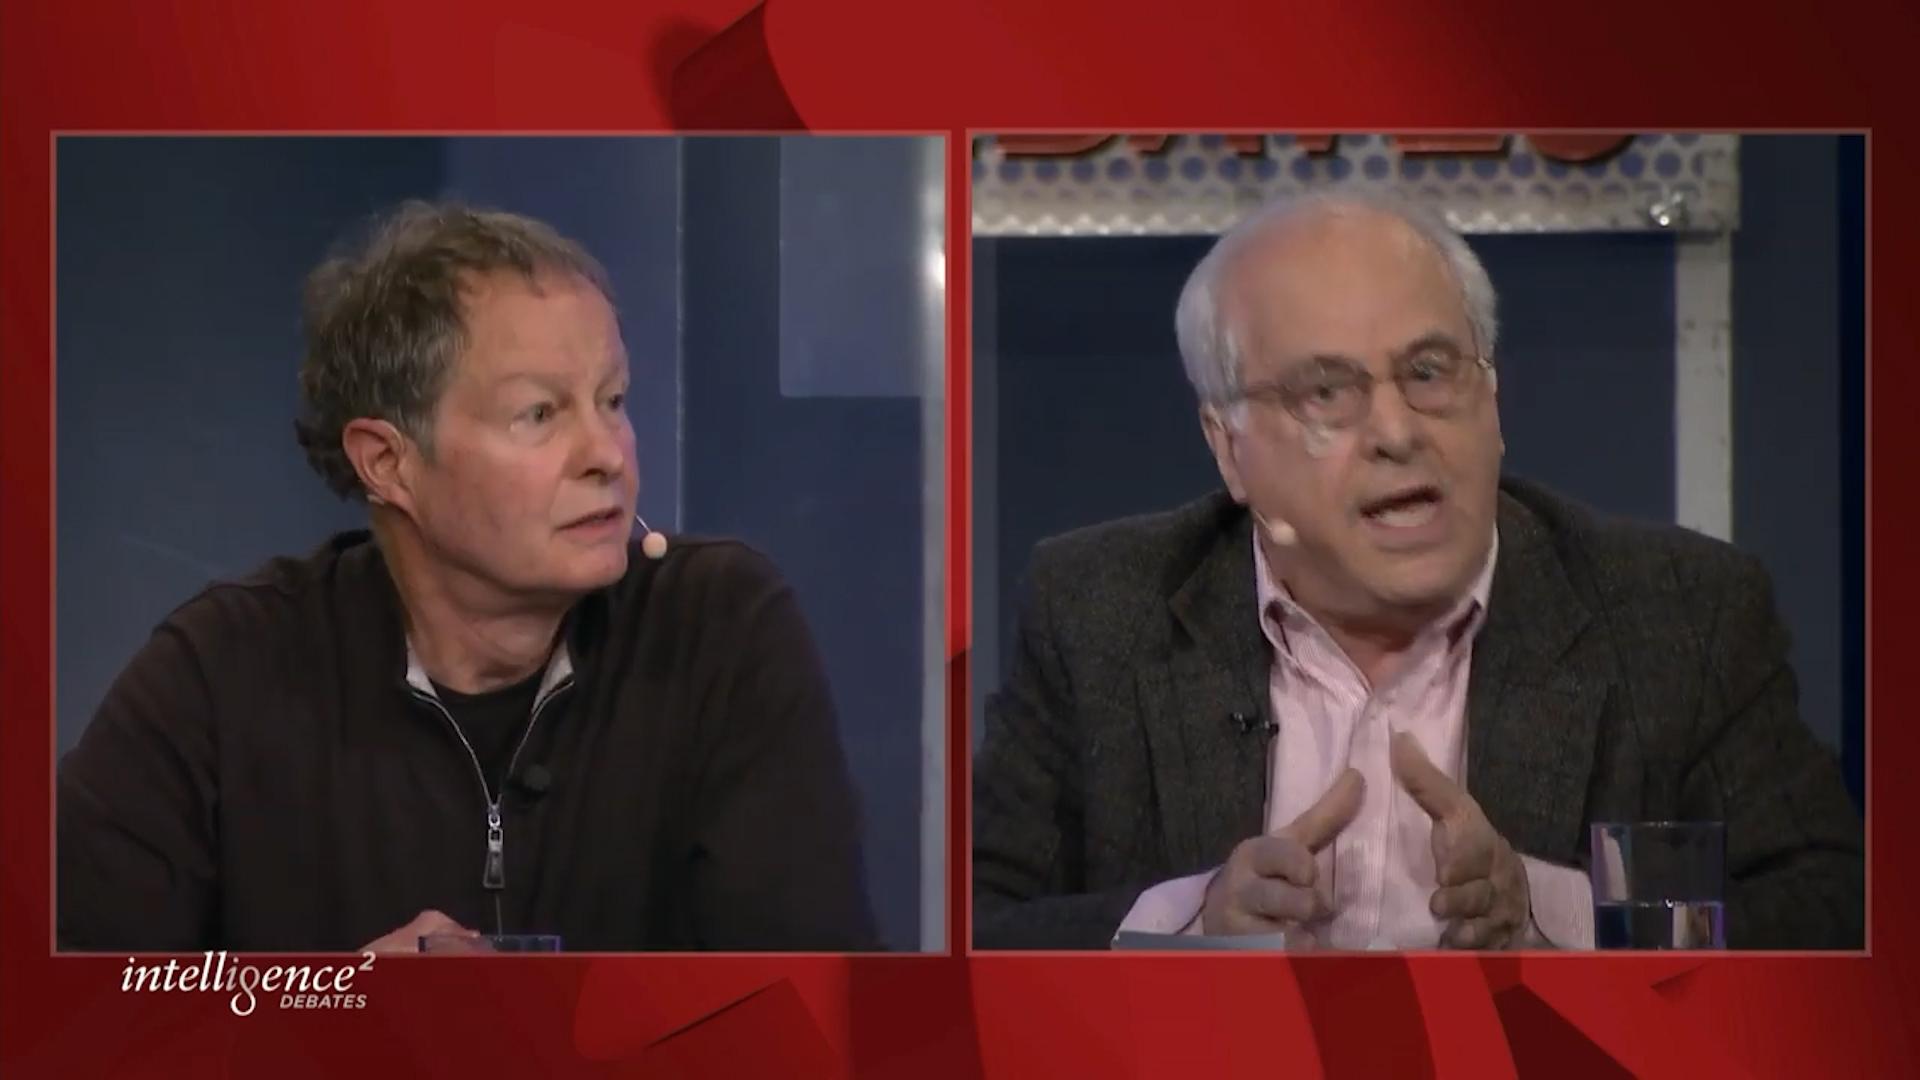 Economist Richard Wolff annihilates Whole Foods founder John Mackey in capitalism debate